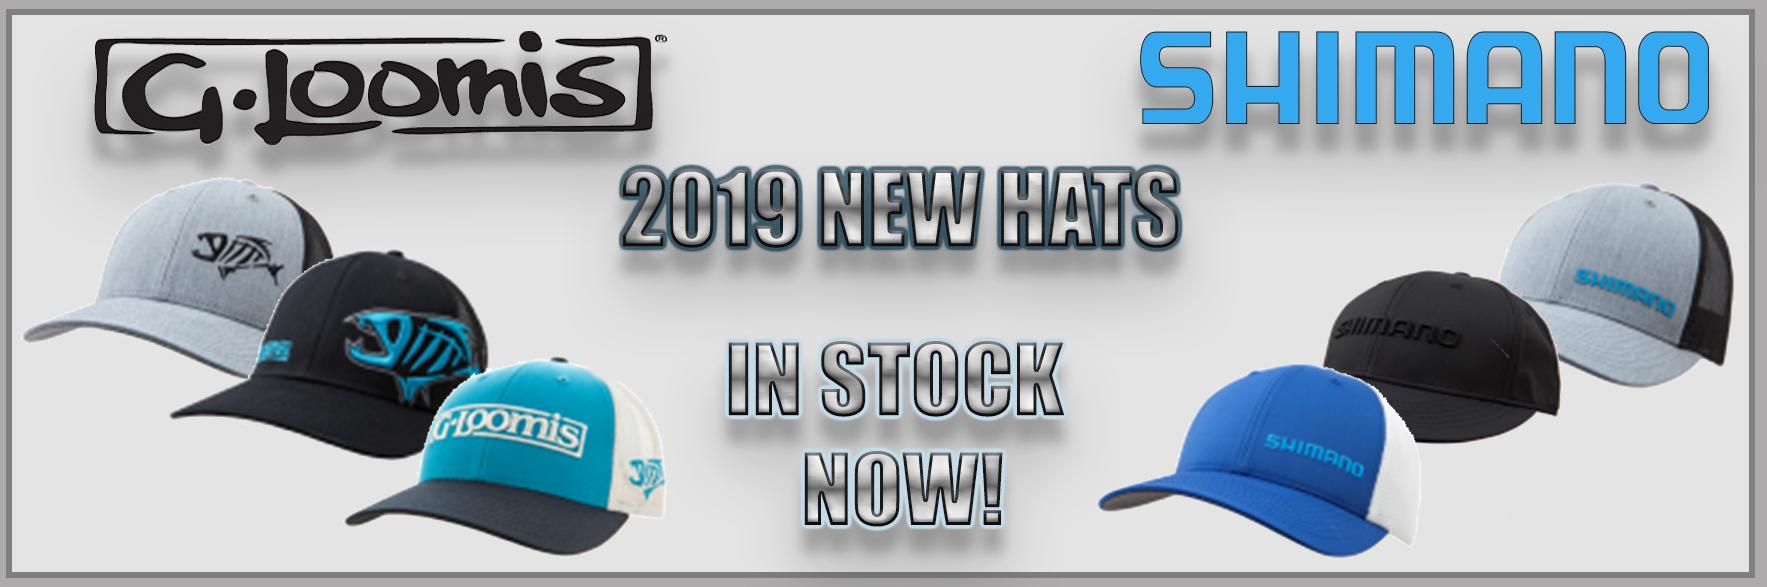 New 2019 G. Loomis & Shimano Hats